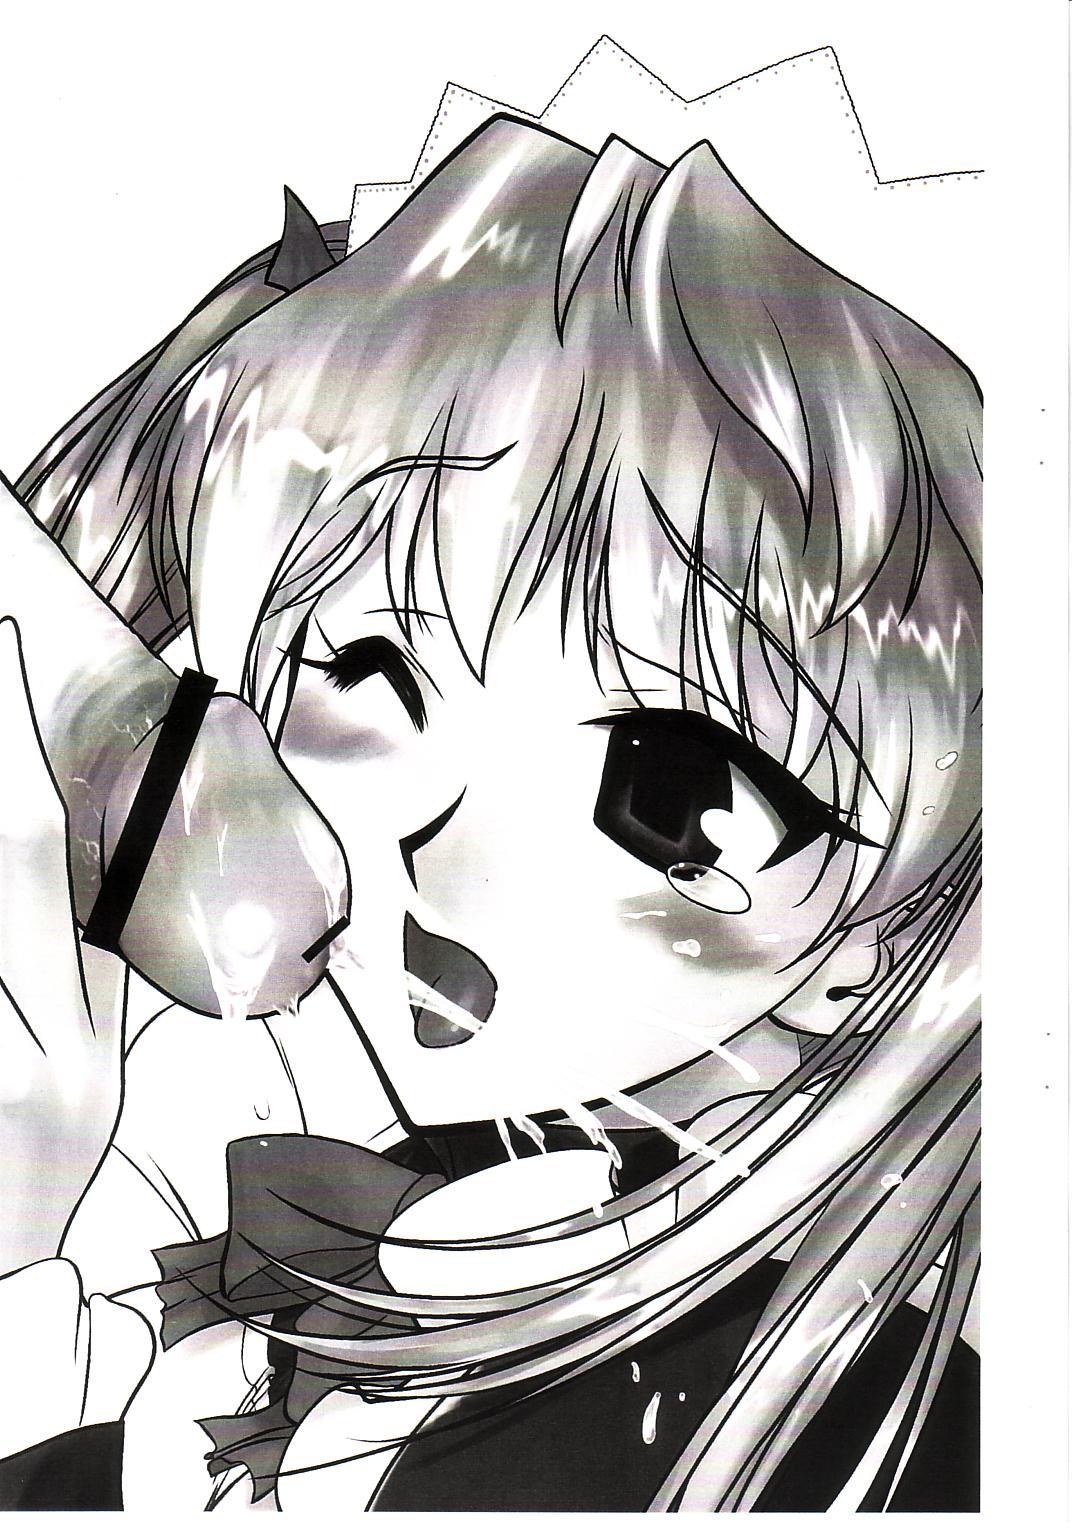 Maid Eri-tan 6